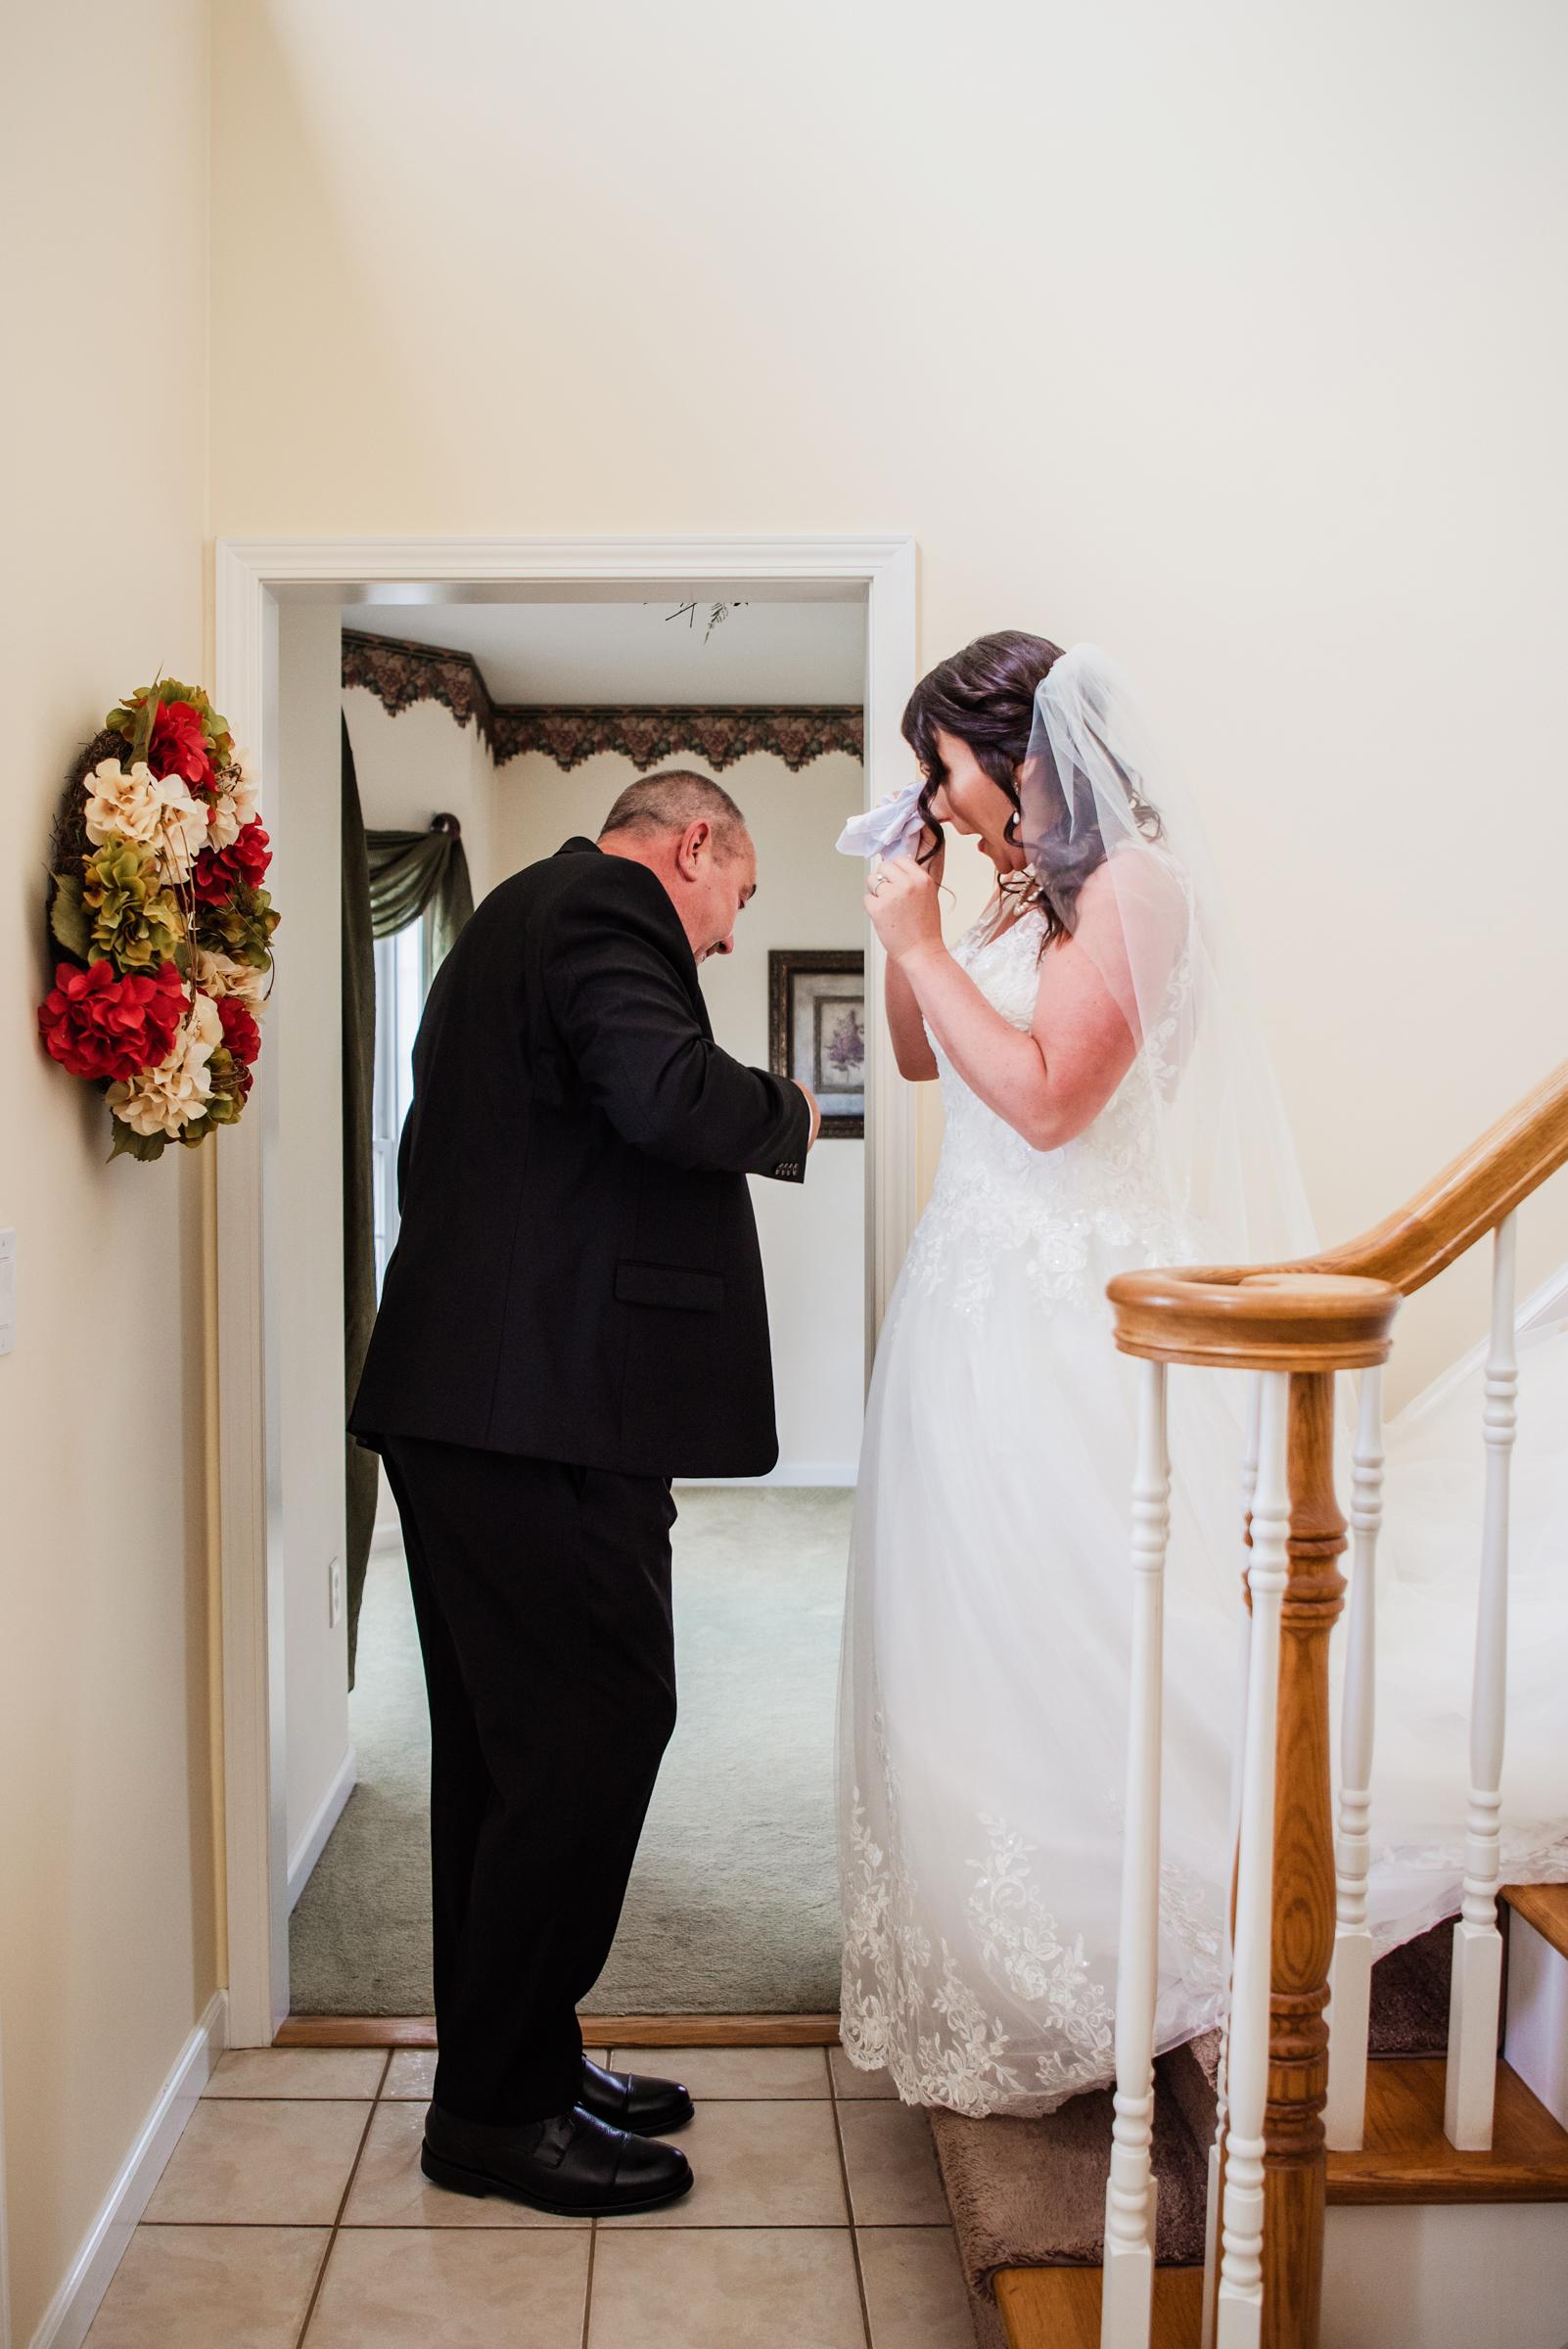 Historic_Old_St_Johns_Church_Valentinos_Banquet_Hall_Central_NY_Wedding_JILL_STUDIO_Rochester_NY_Photographer_DSC_5506.jpg